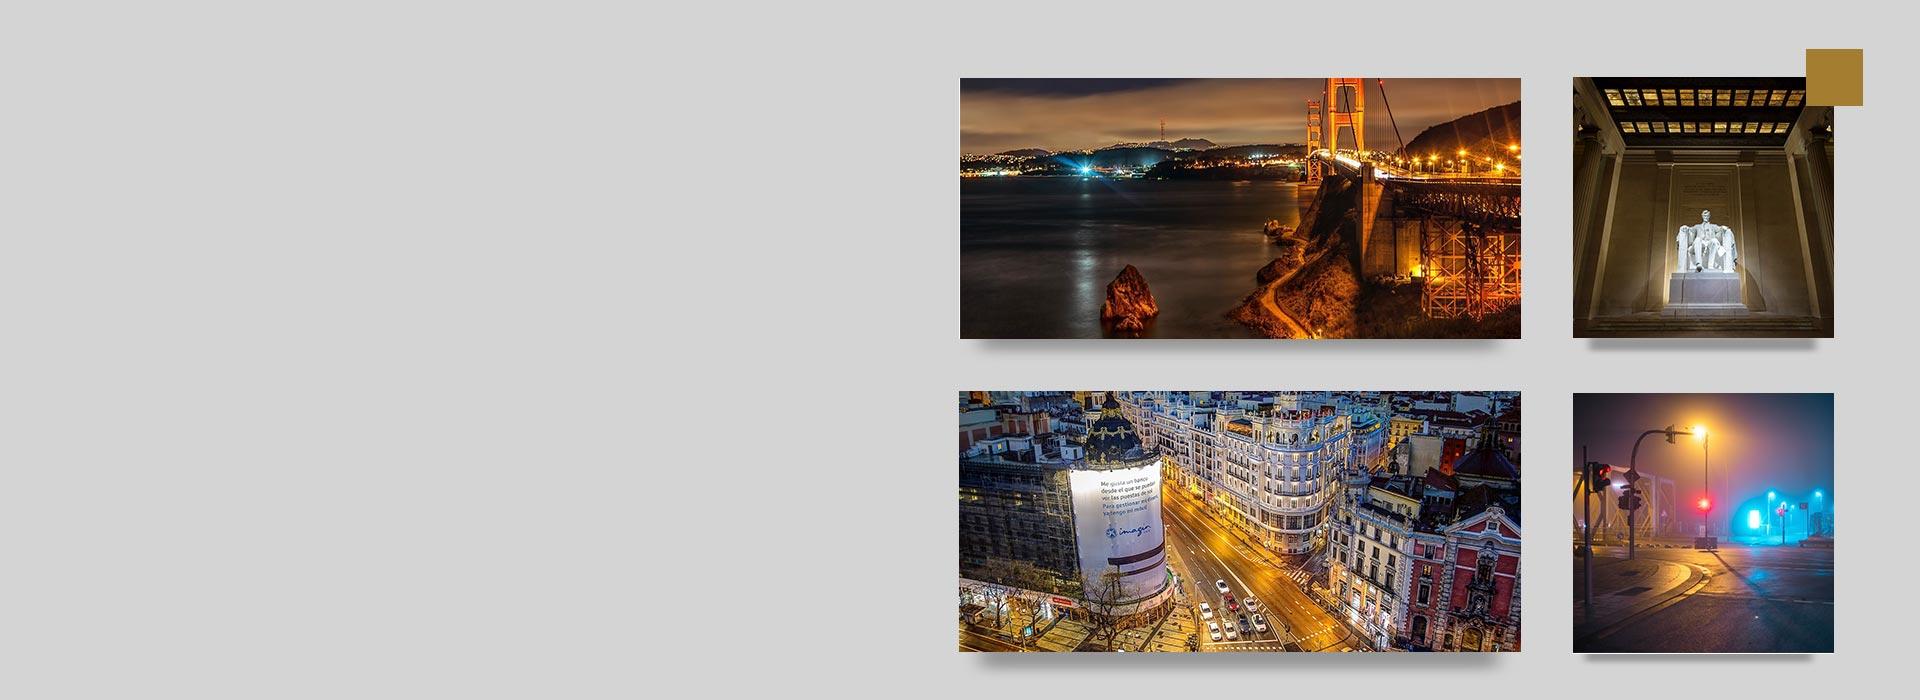 Lens hood night photography - عکاسی در شب